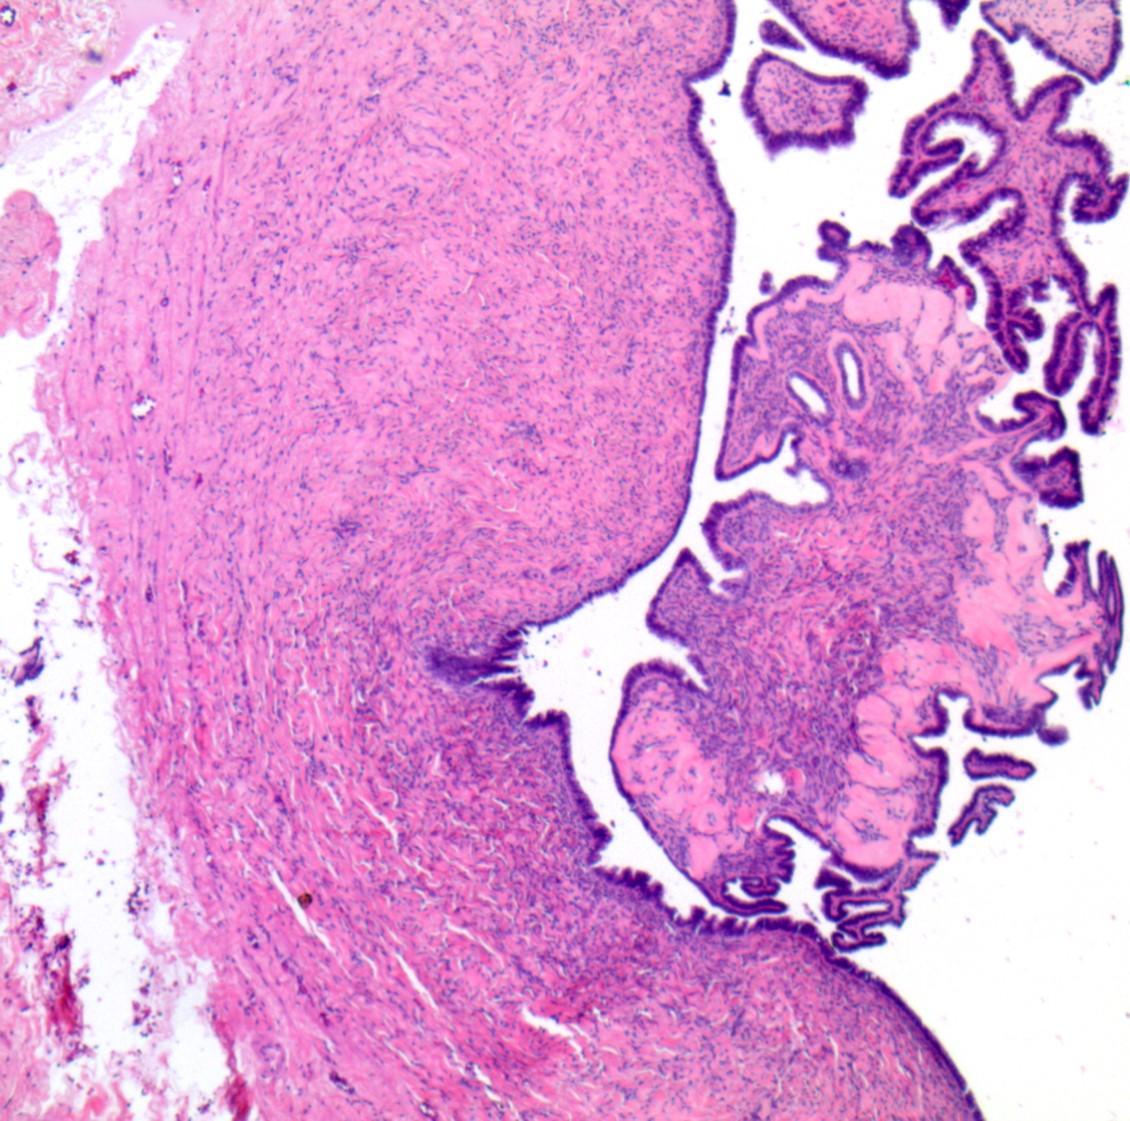 Serous cystadenoma with focal epithelial proliferation